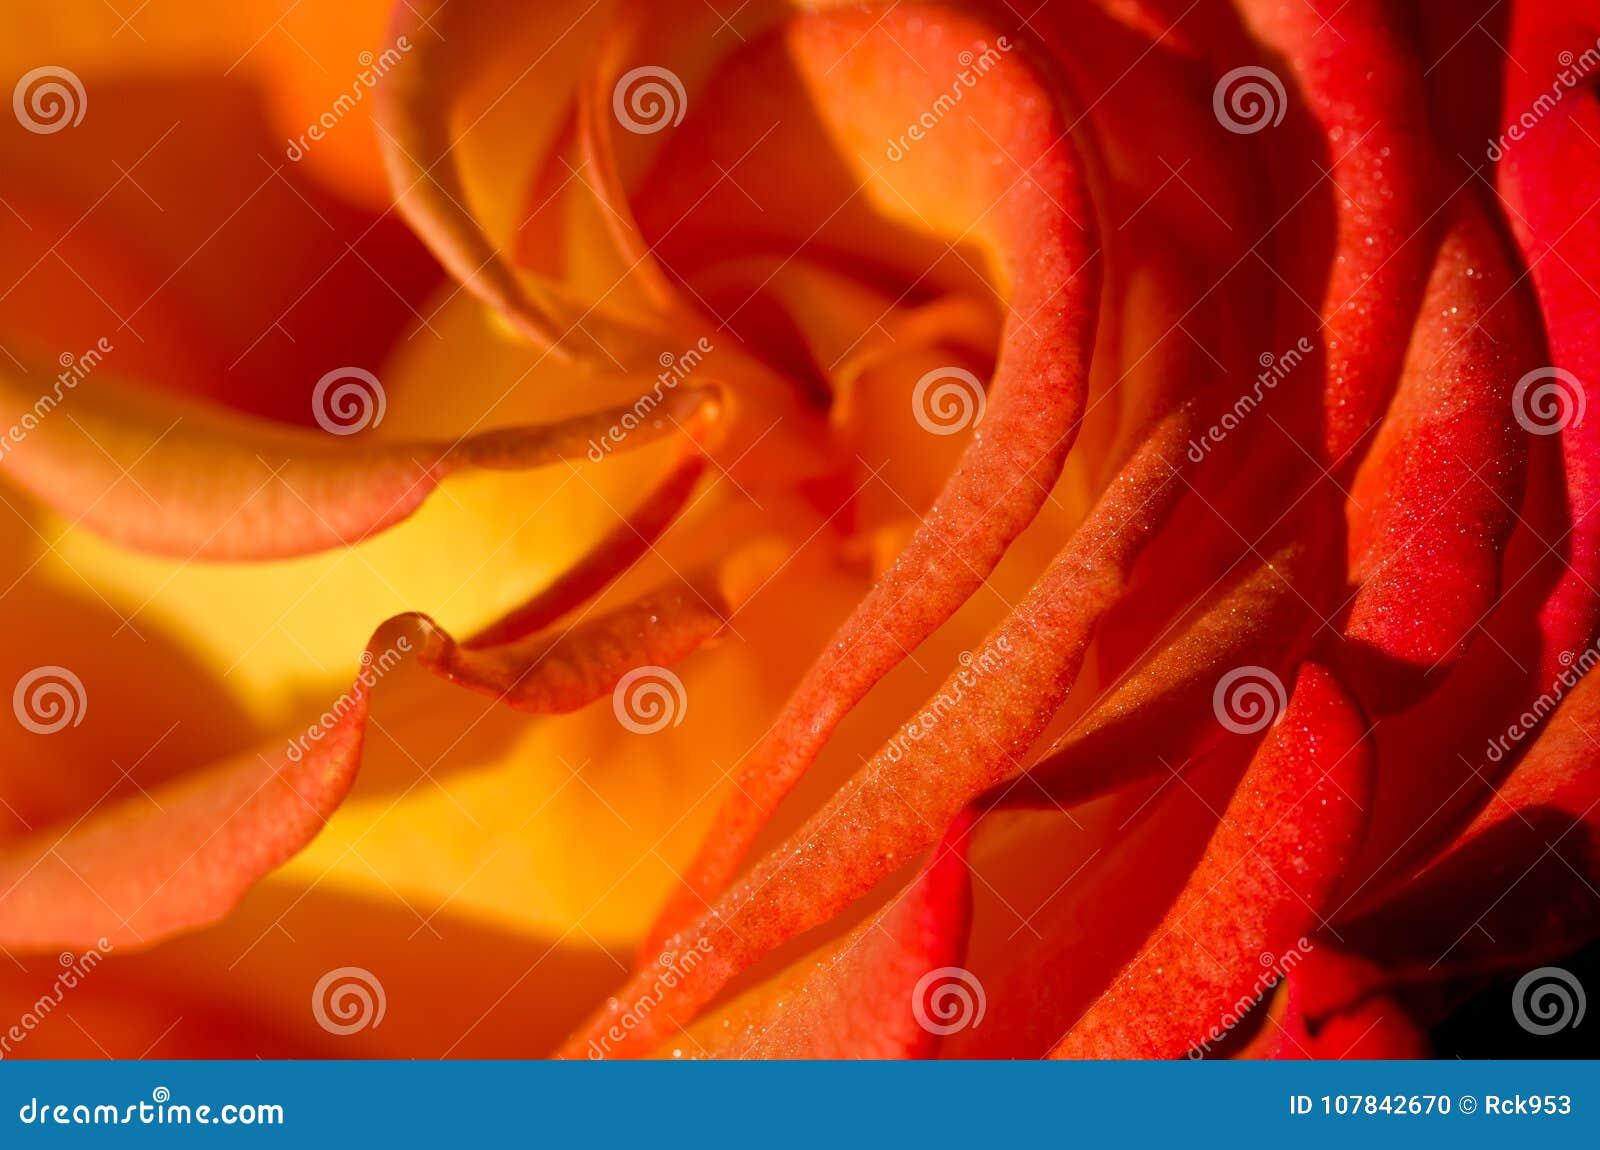 Sumário da natureza: Perdido nas dobras delicadas da Rosa delicada